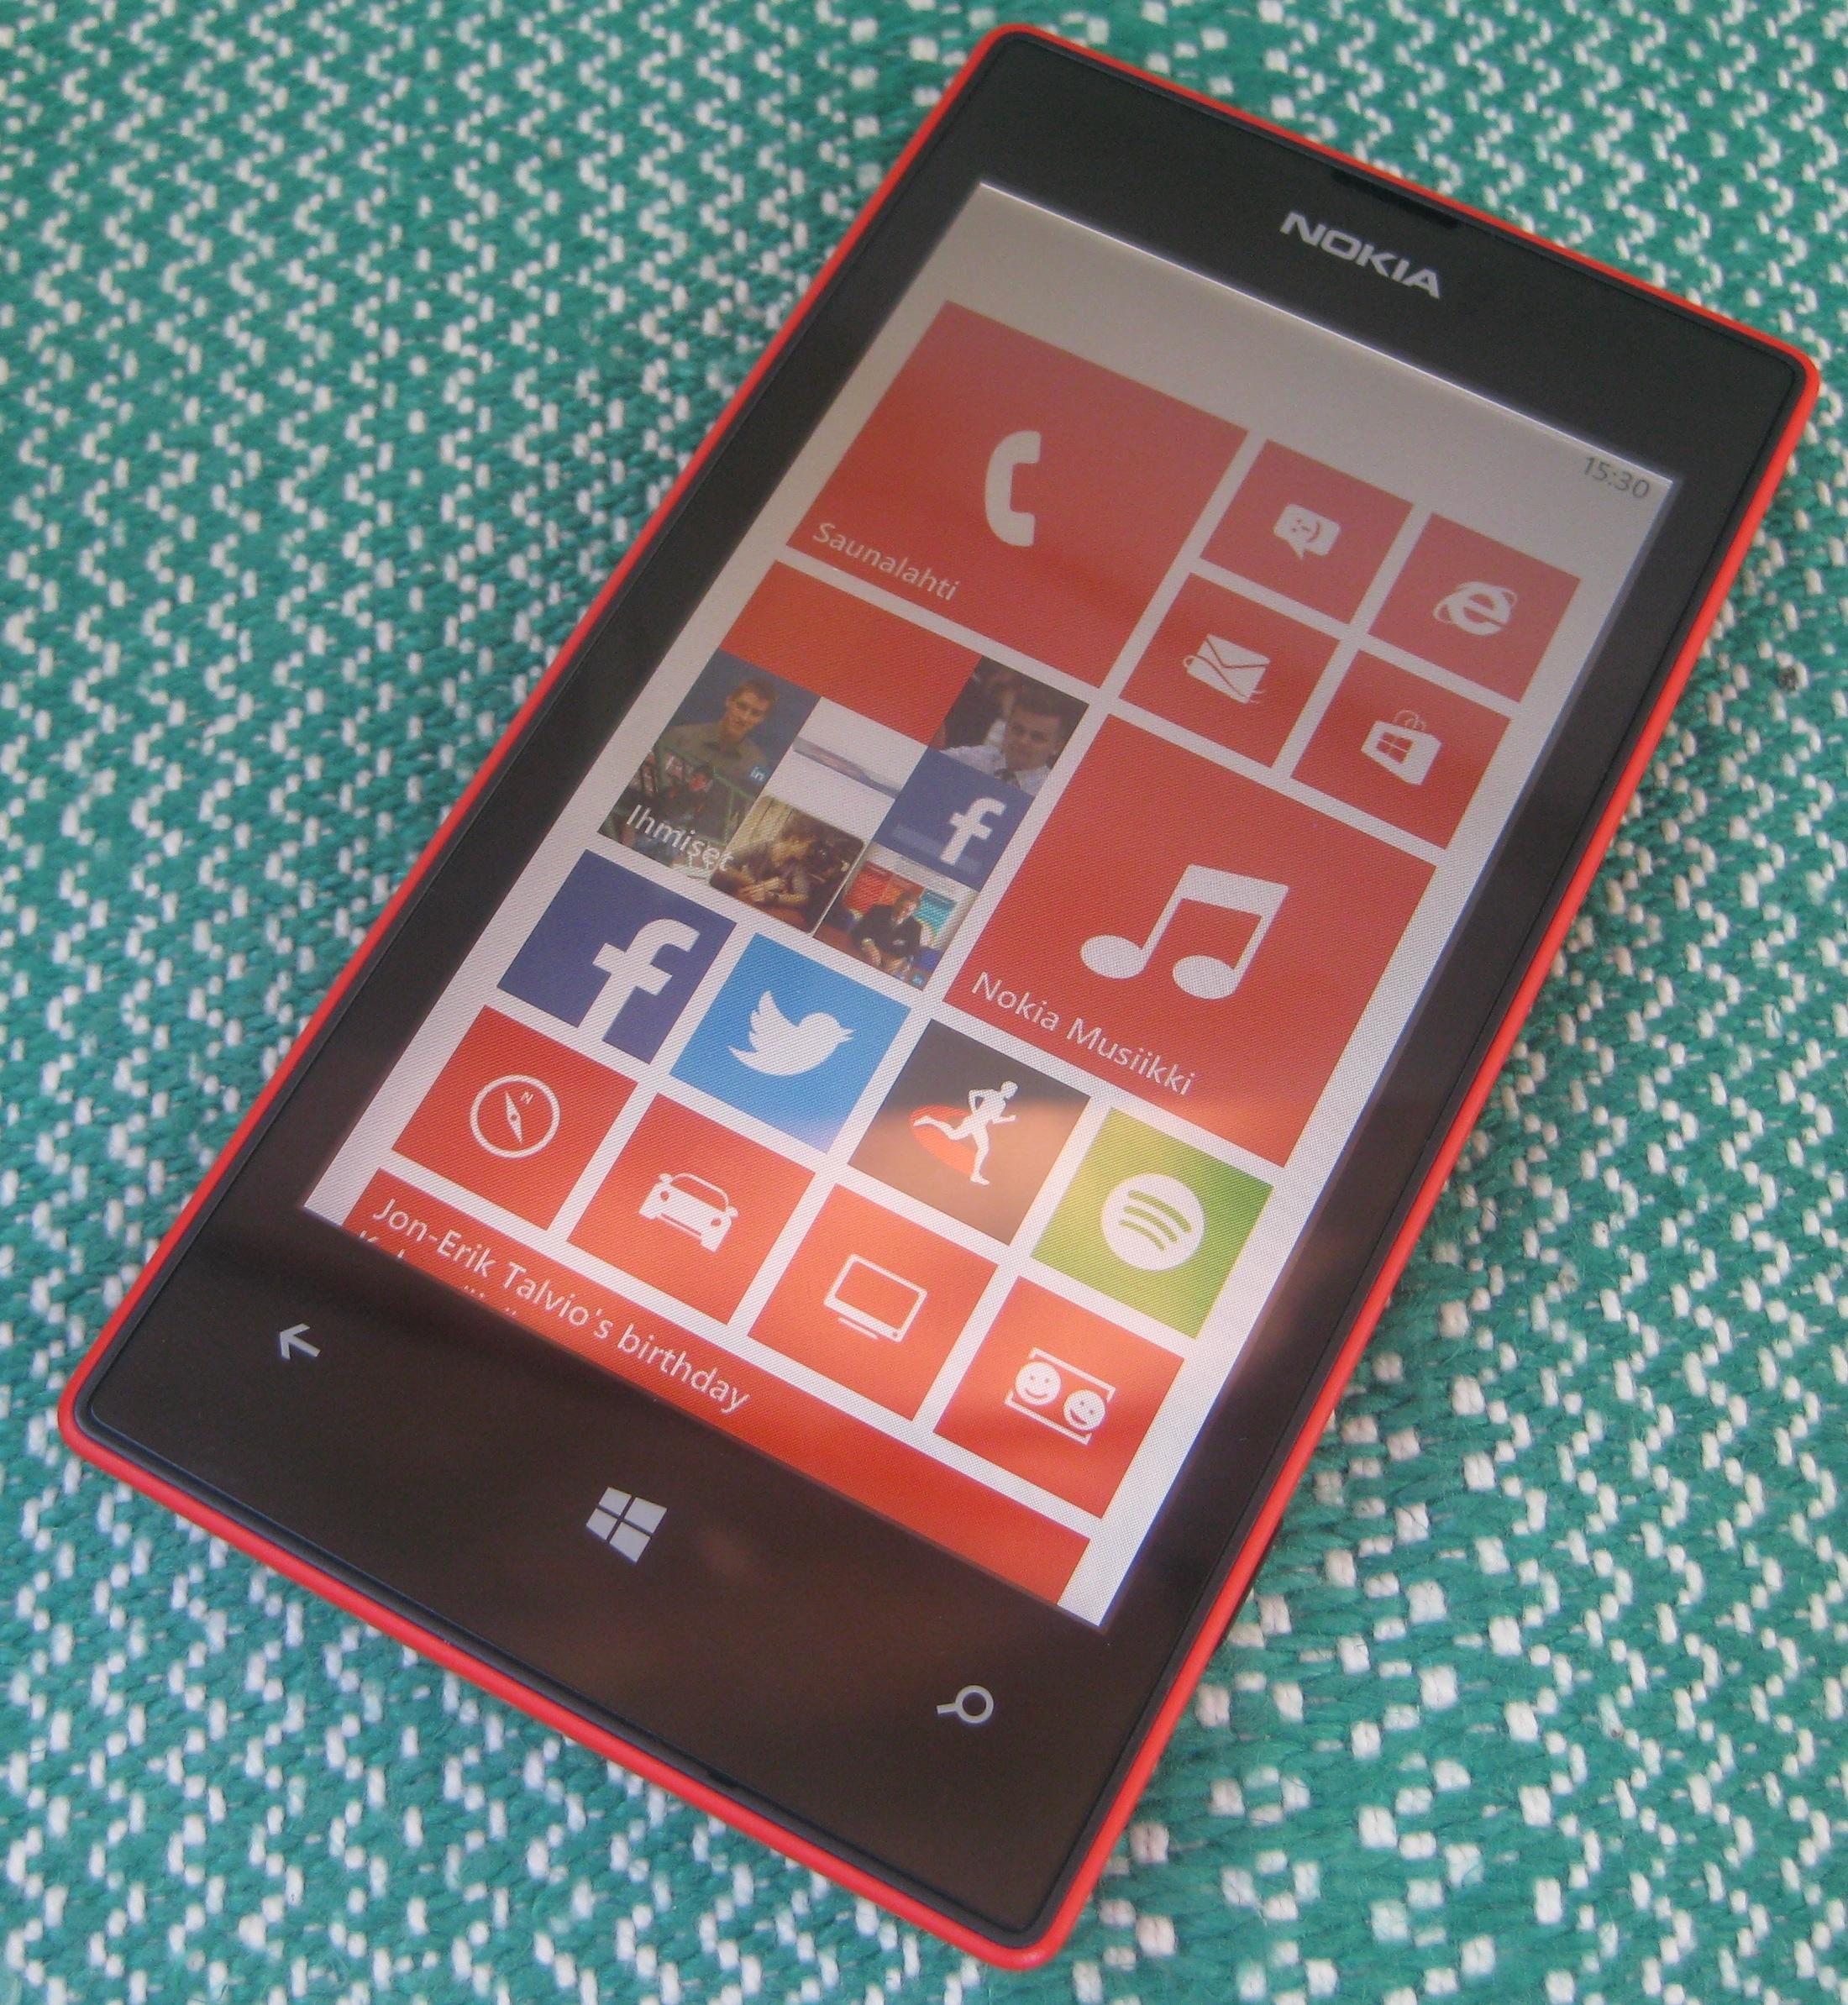 Nokia Lumia 520 edestä